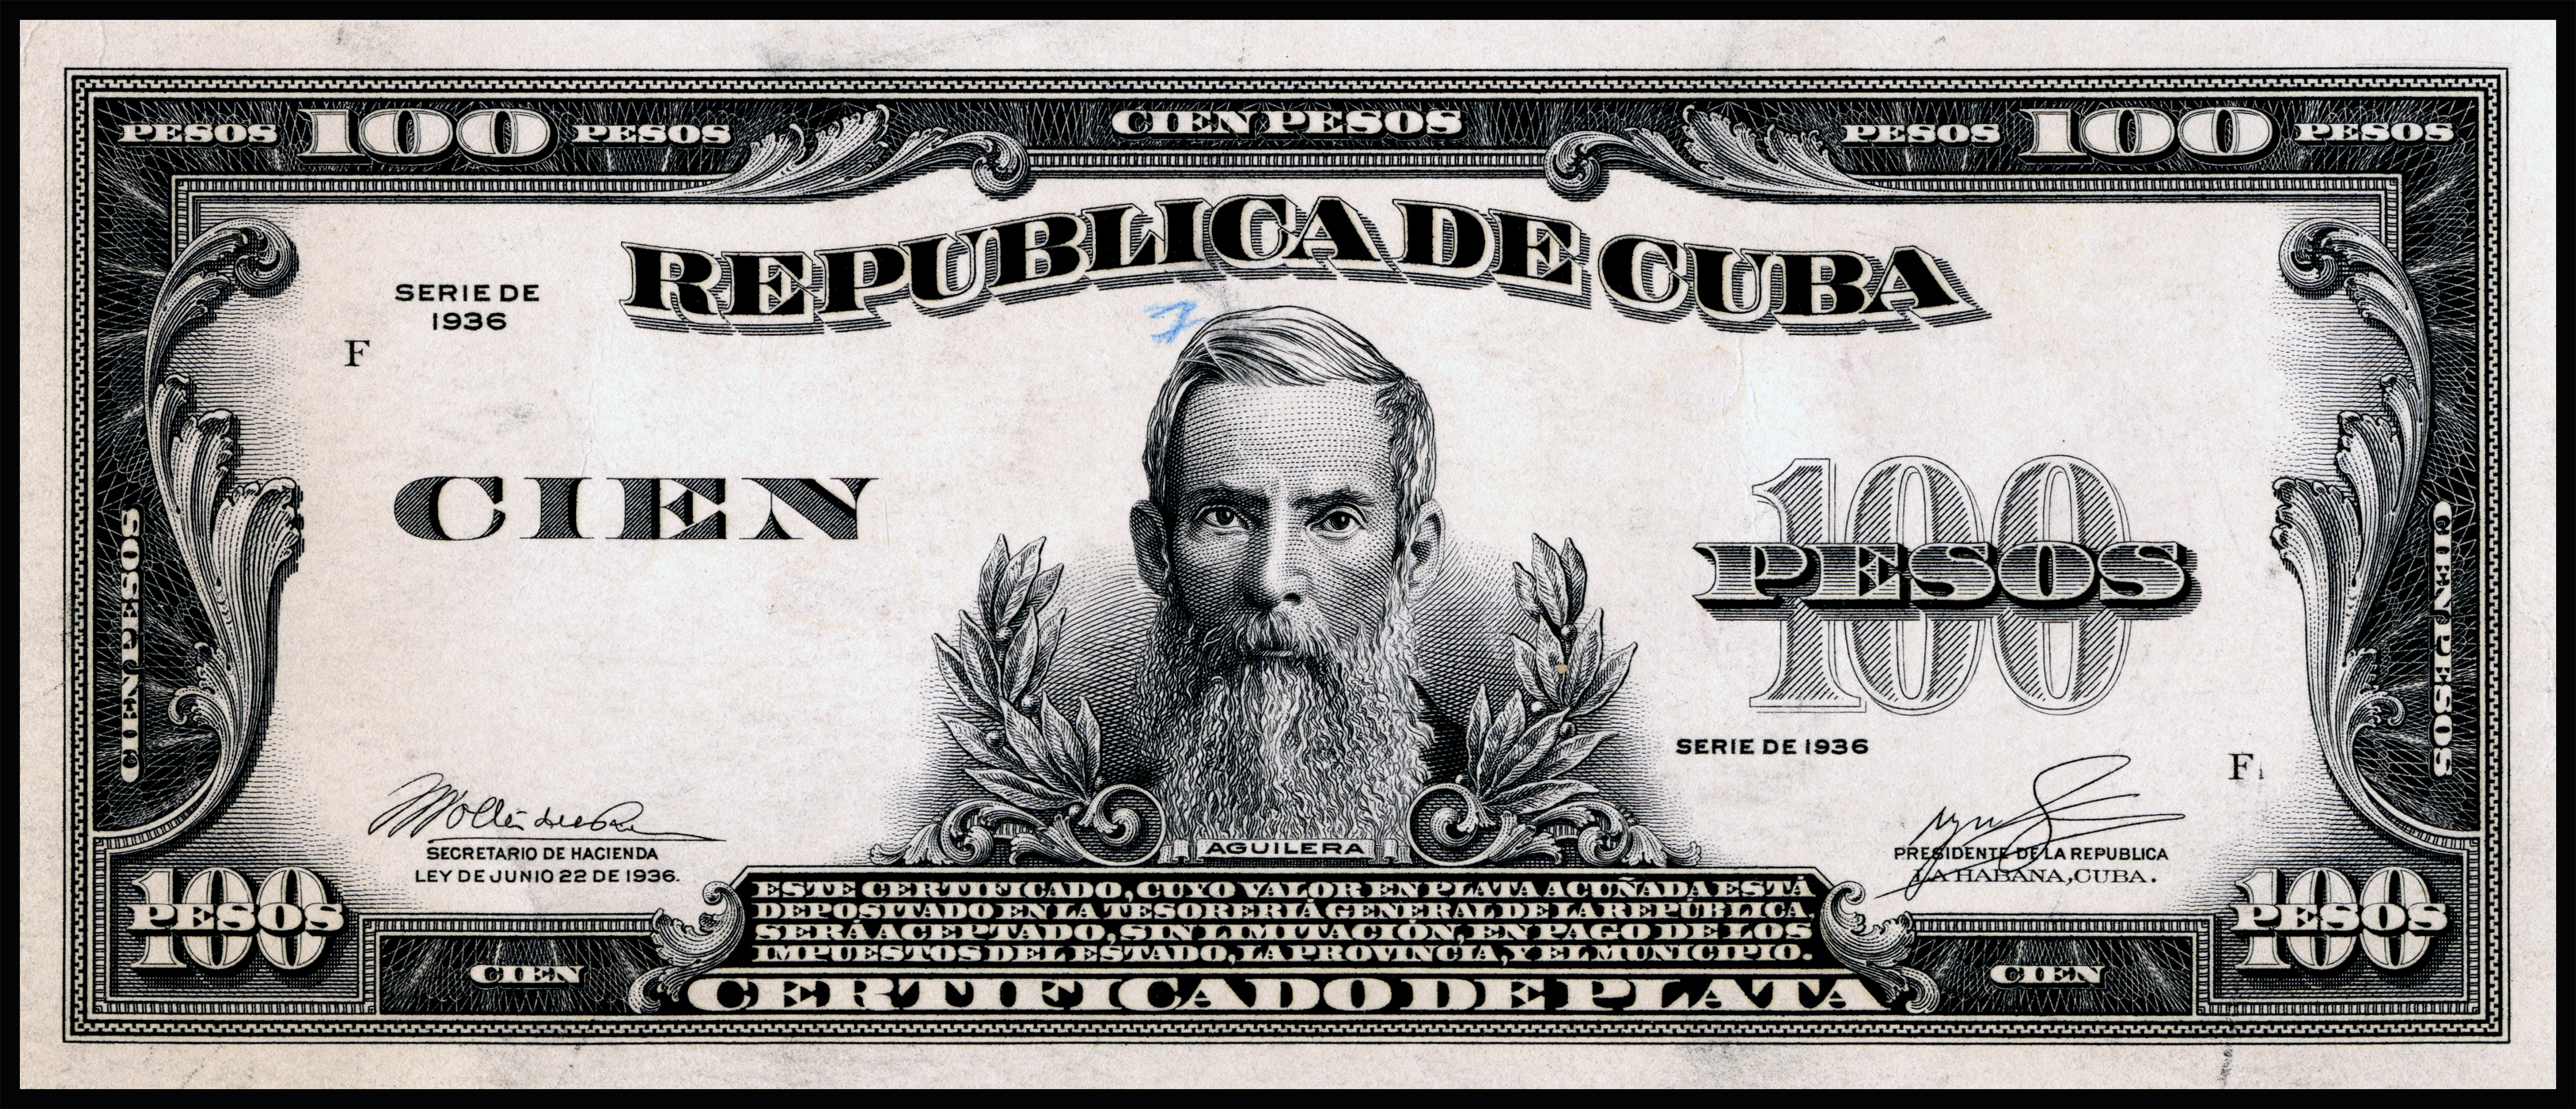 US-BEP-Rep%C3%BAblica_de_Cuba_(certified_proof)_100_silver_pesos,_1936_(CUB-74b).jpg